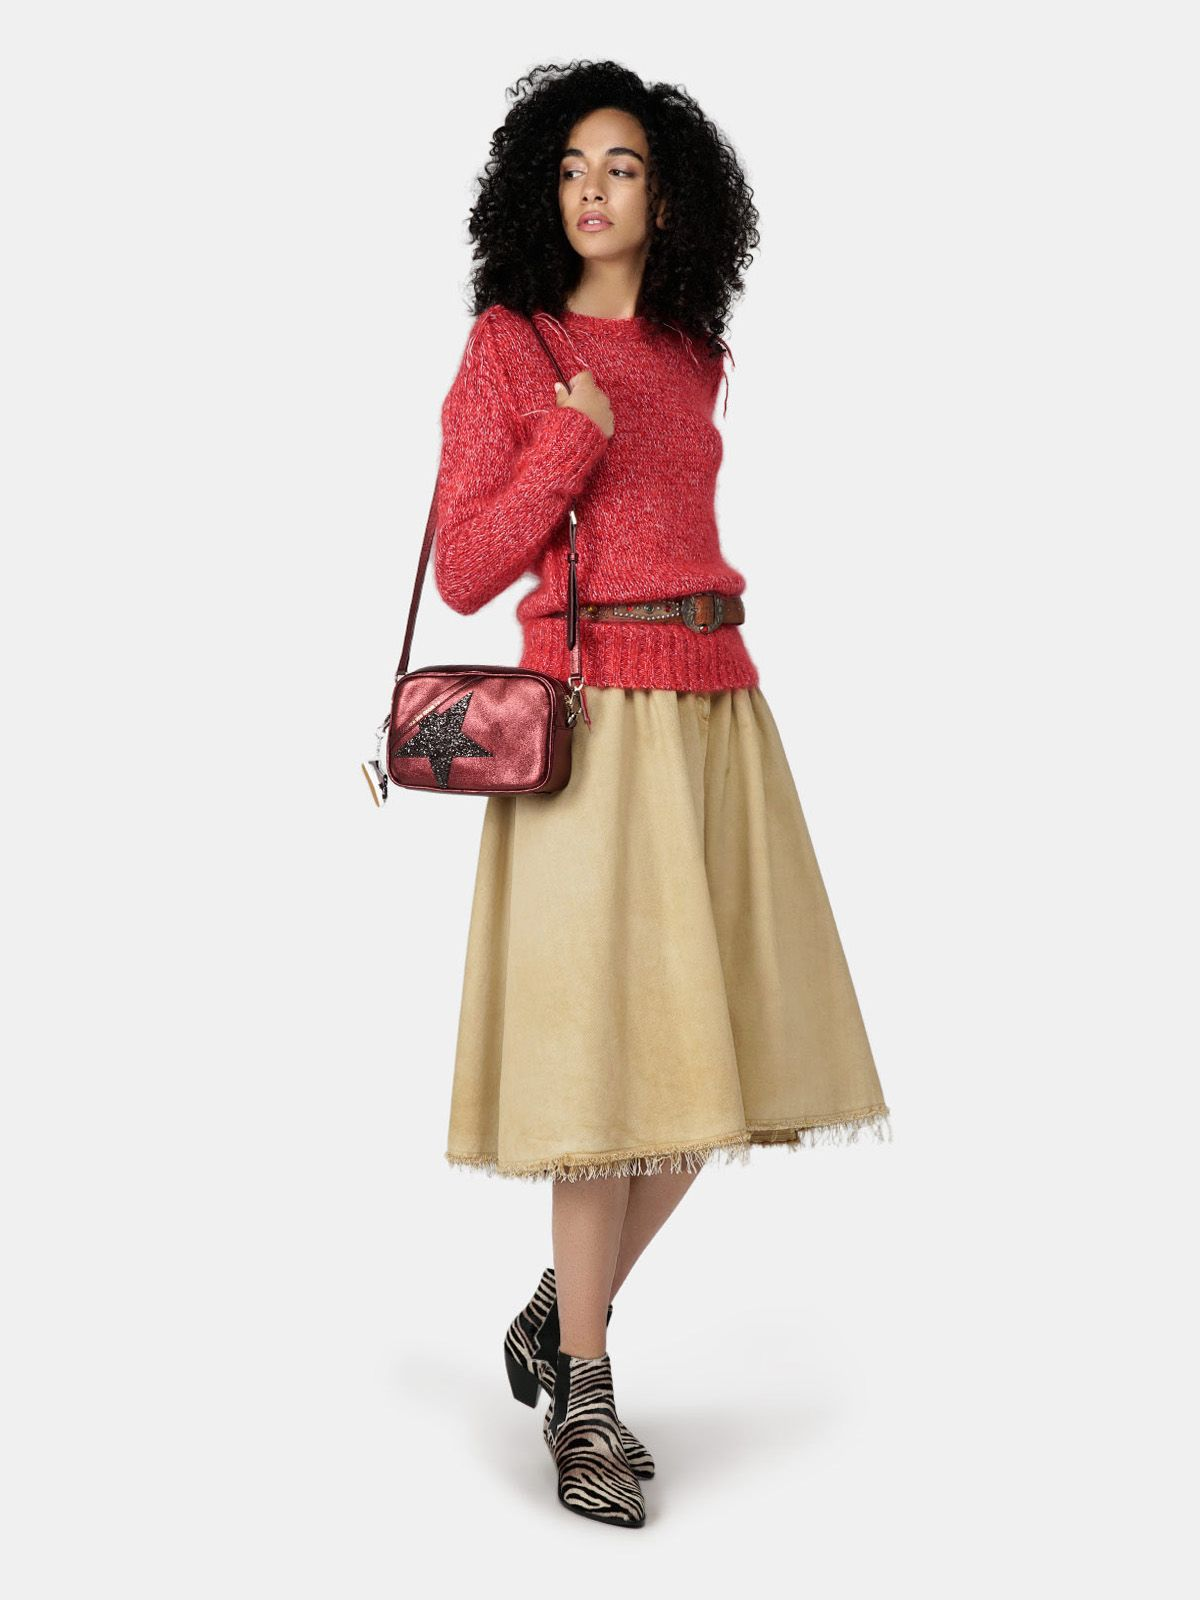 Golden Goose - Adele skirt in dyed denim with raw edge bottom in